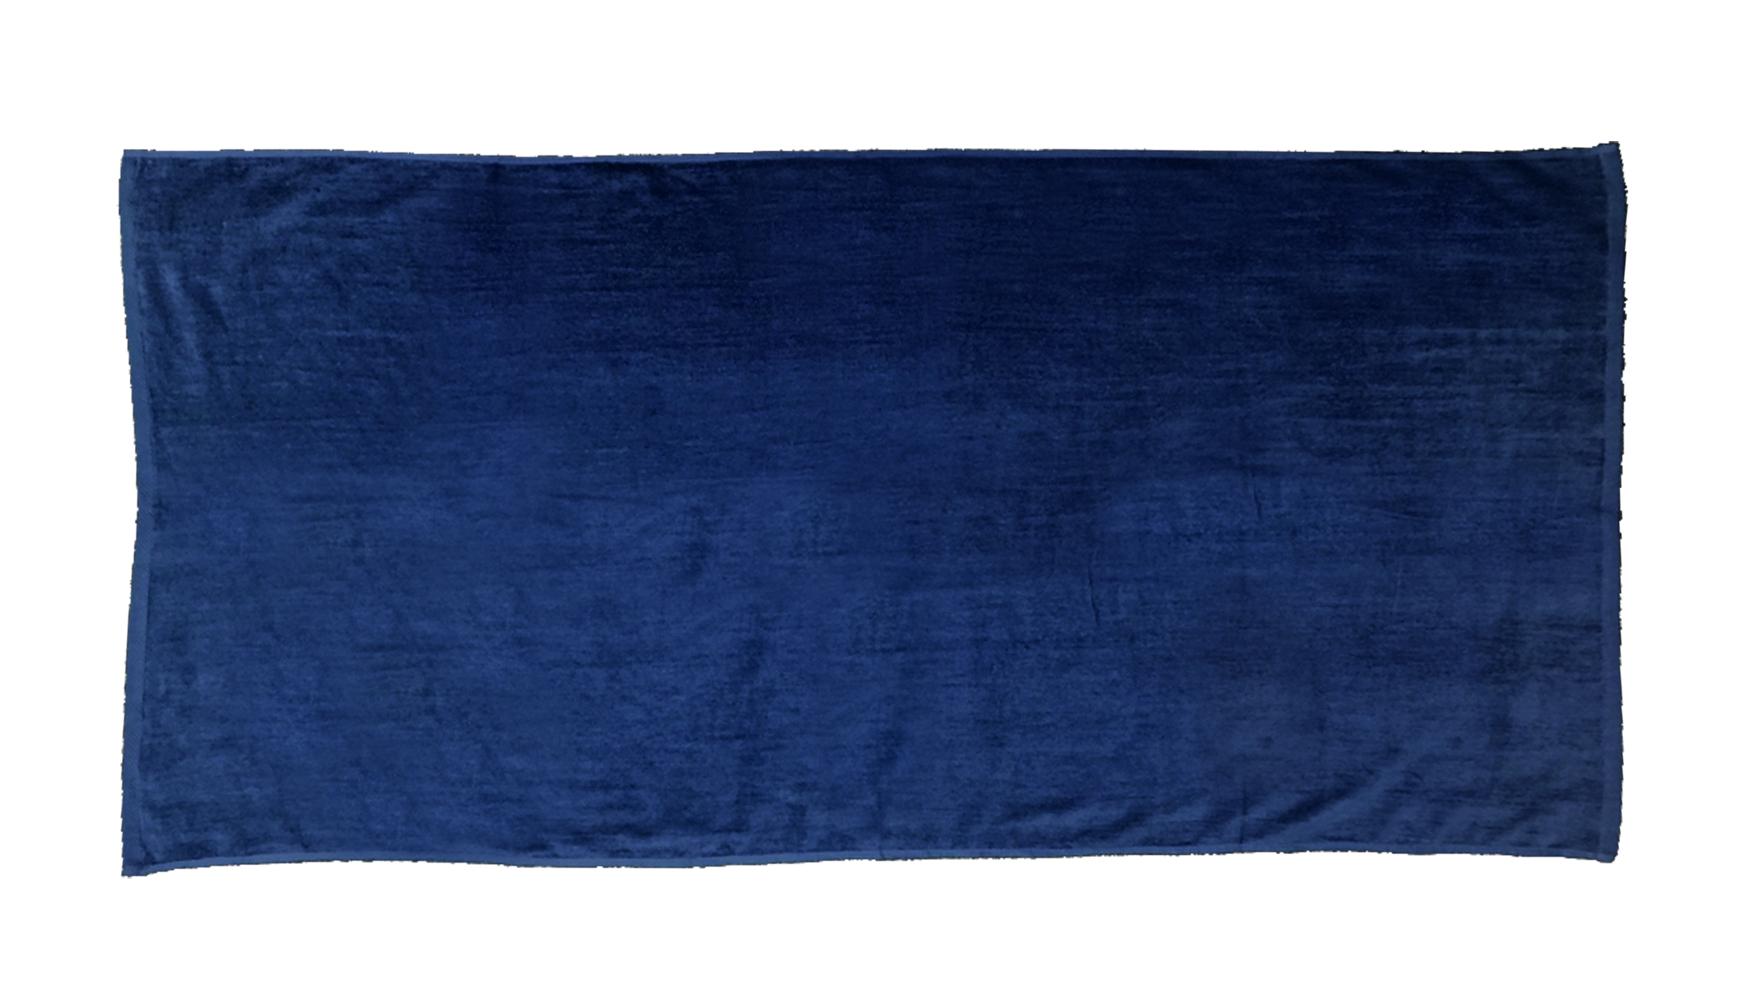 Towelsoutlet Com 28x58 Economy Light Weight 8 5 Lbs Dz